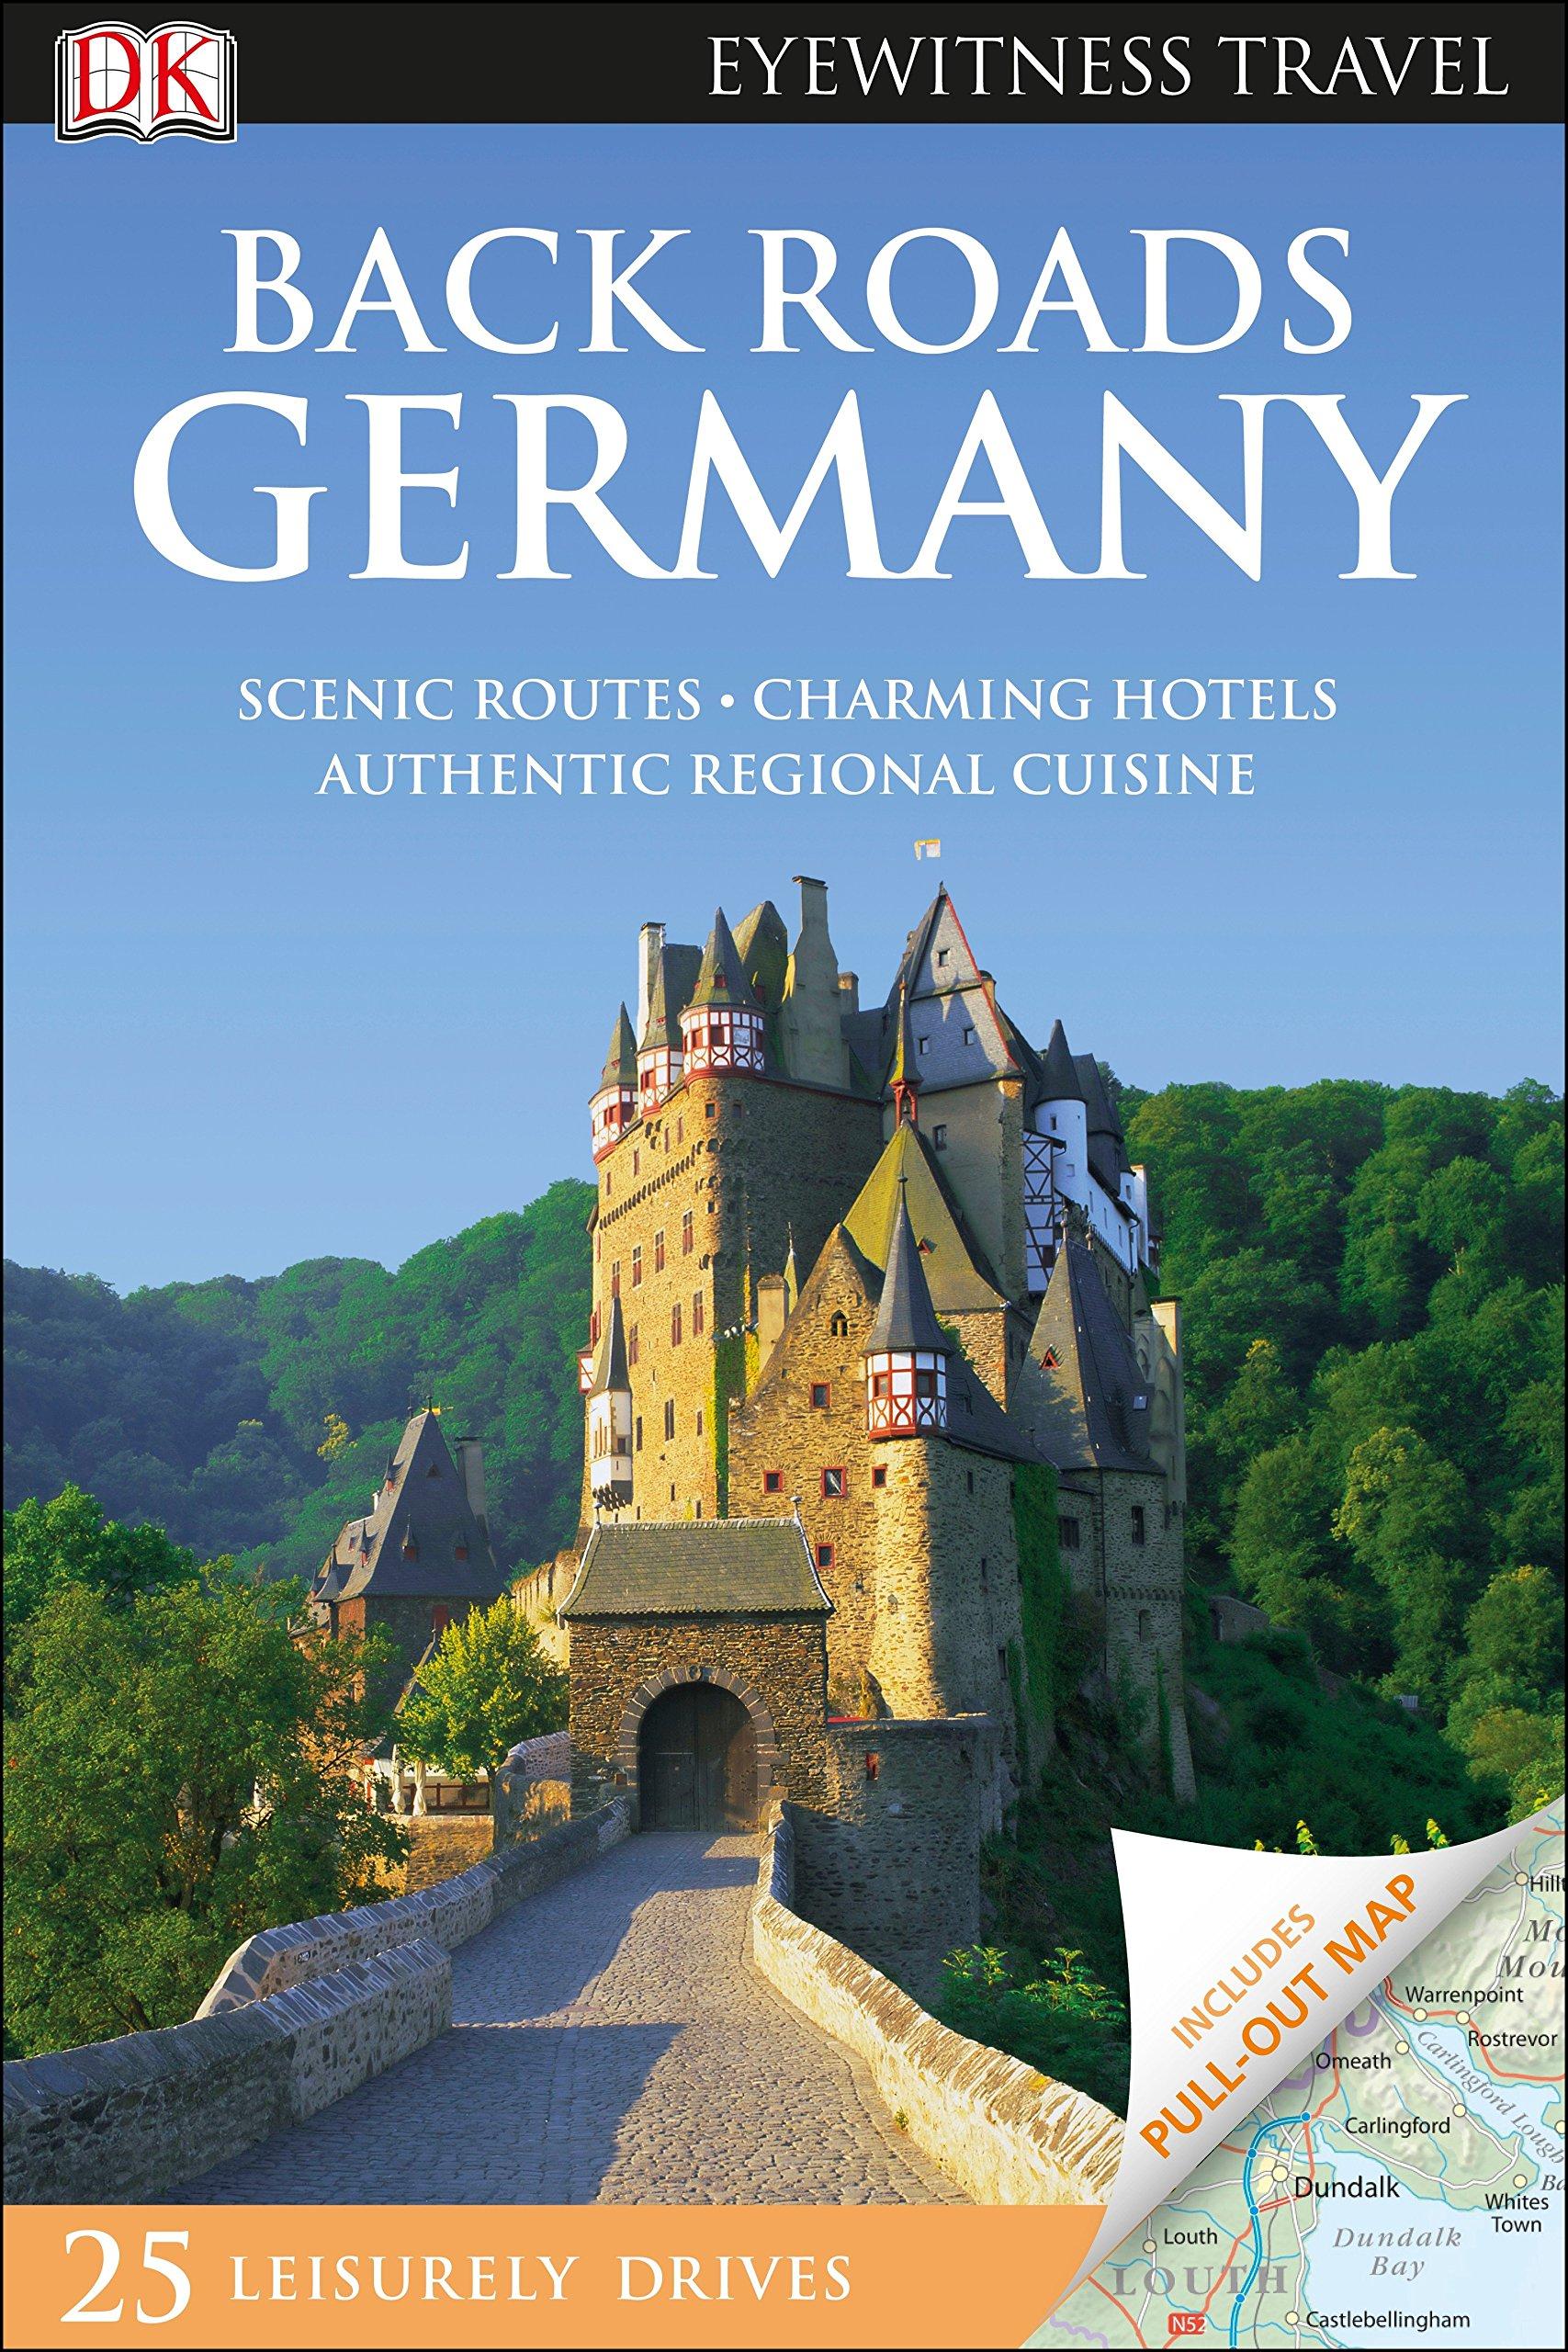 Back Roads Germany (Eyewitness Travel Back Roads): DK Travel:  9781465457288: Amazon.com: Books